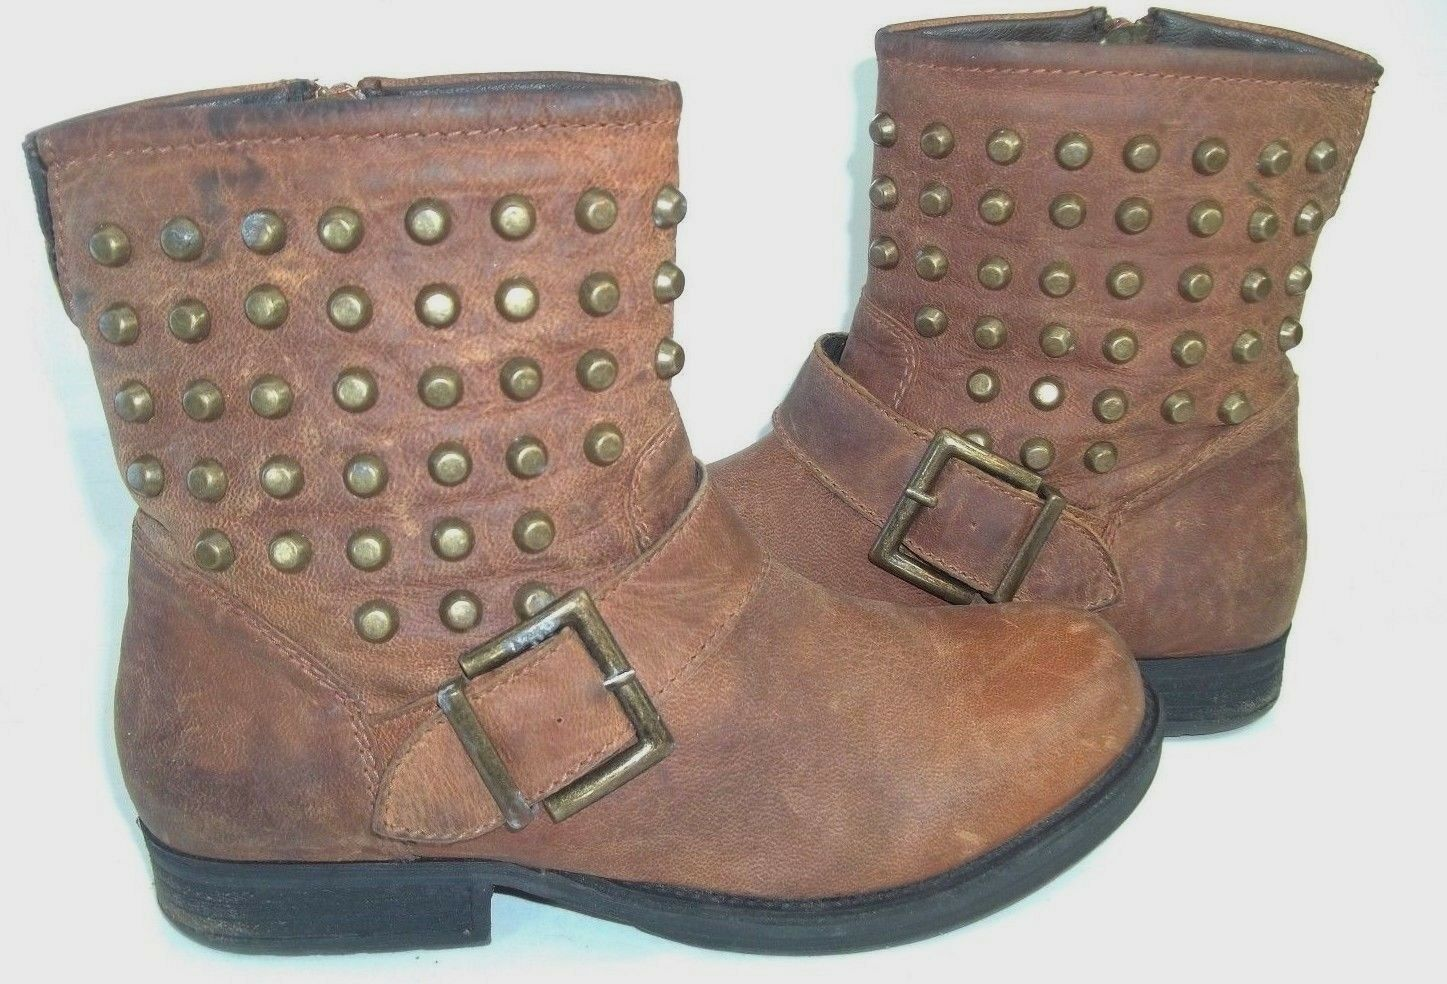 Aldo Damenschuhe Stiefel Ankle US7 Braun Leder Studded detail Zip Buckle distressed